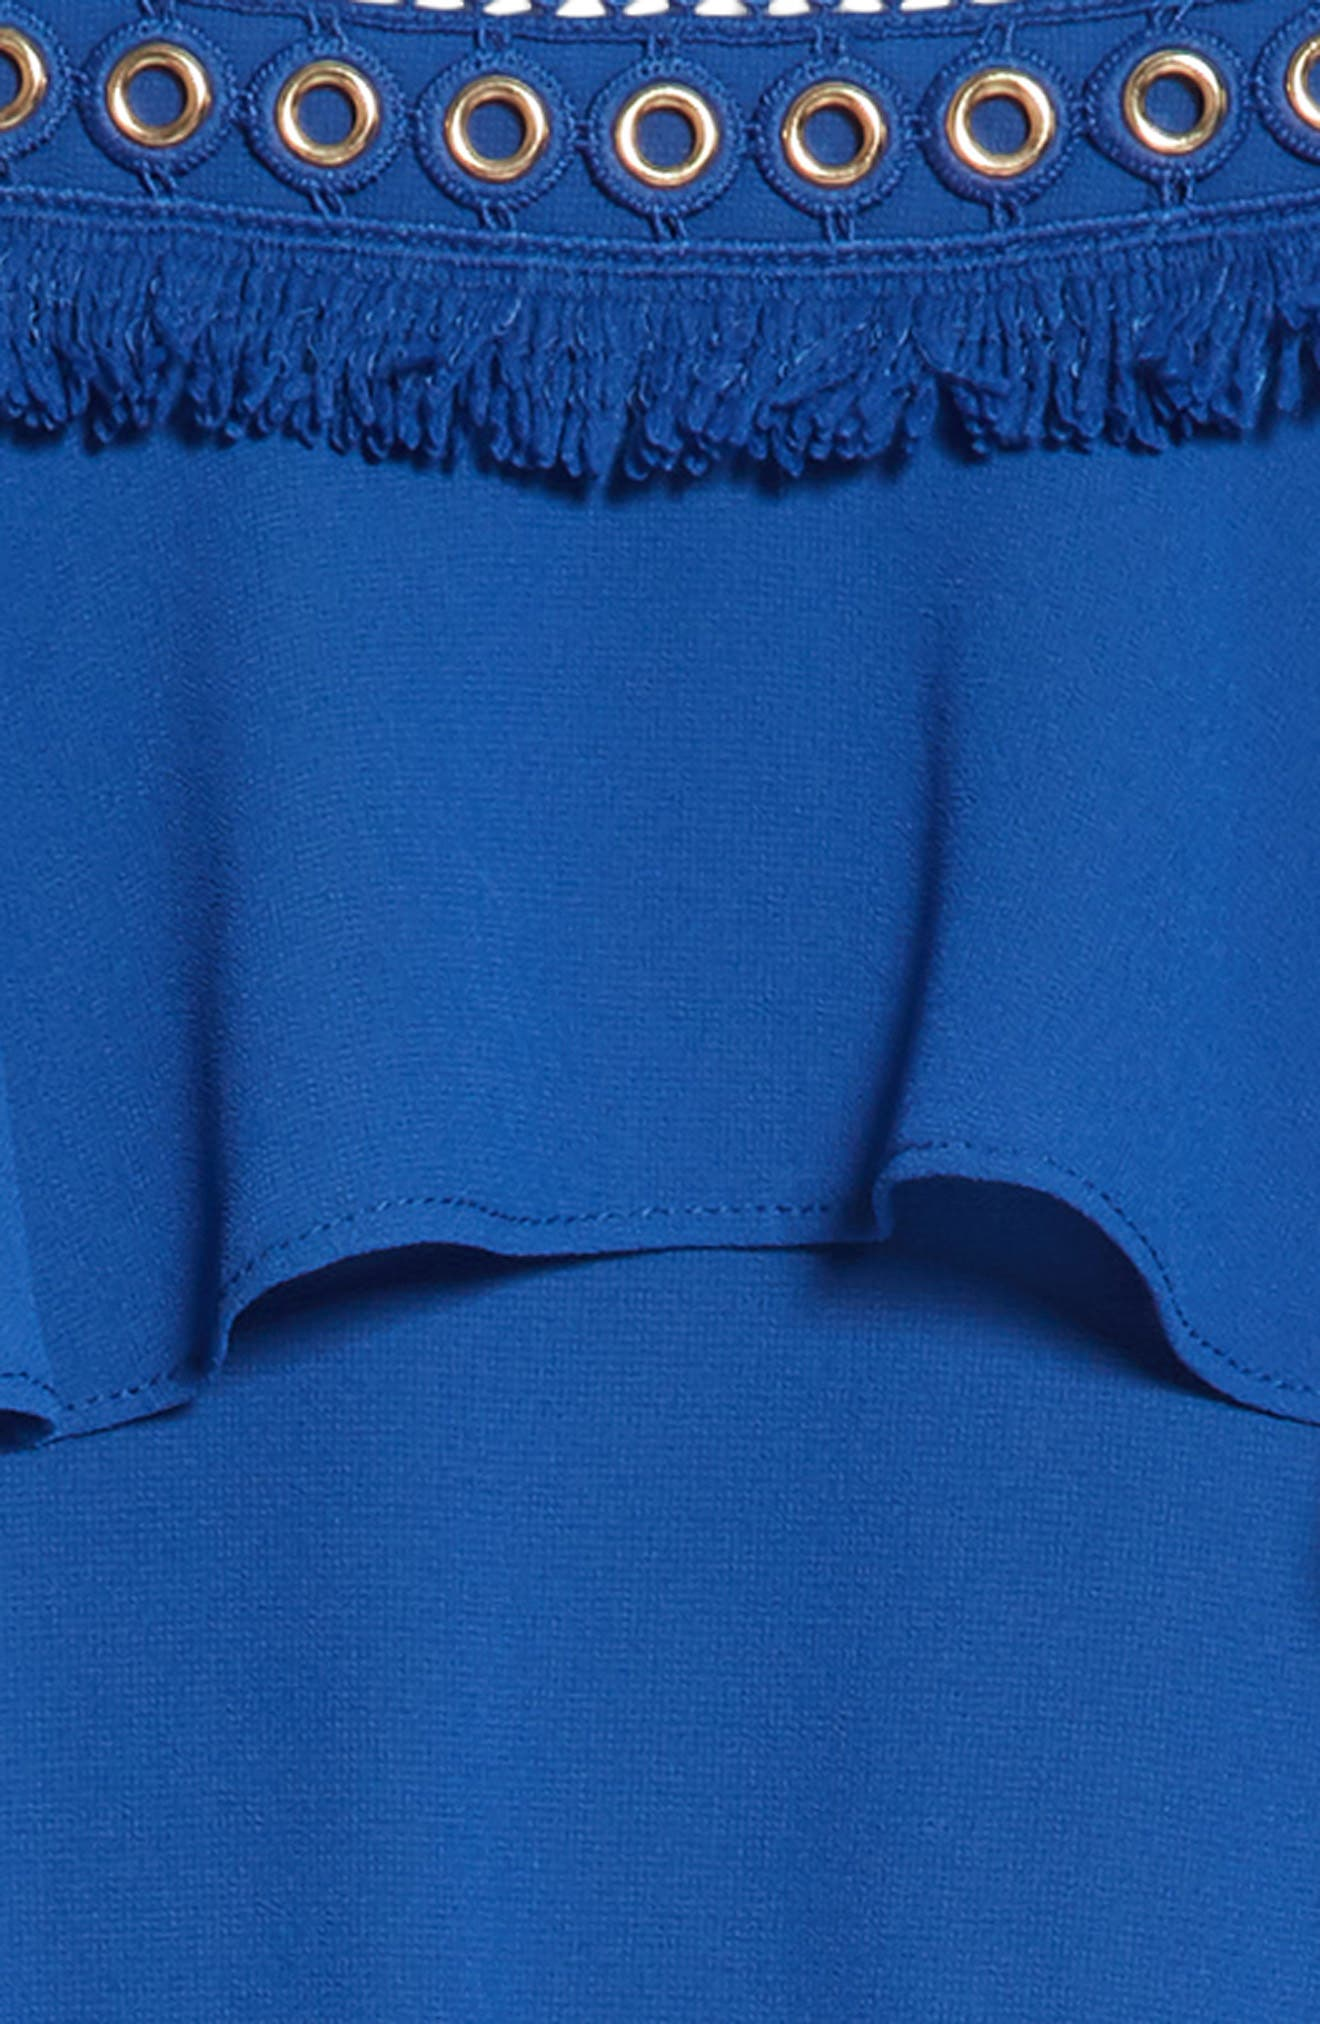 Ruffle Cold Shoulder Dress,                             Alternate thumbnail 3, color,                             Olimpo Blue